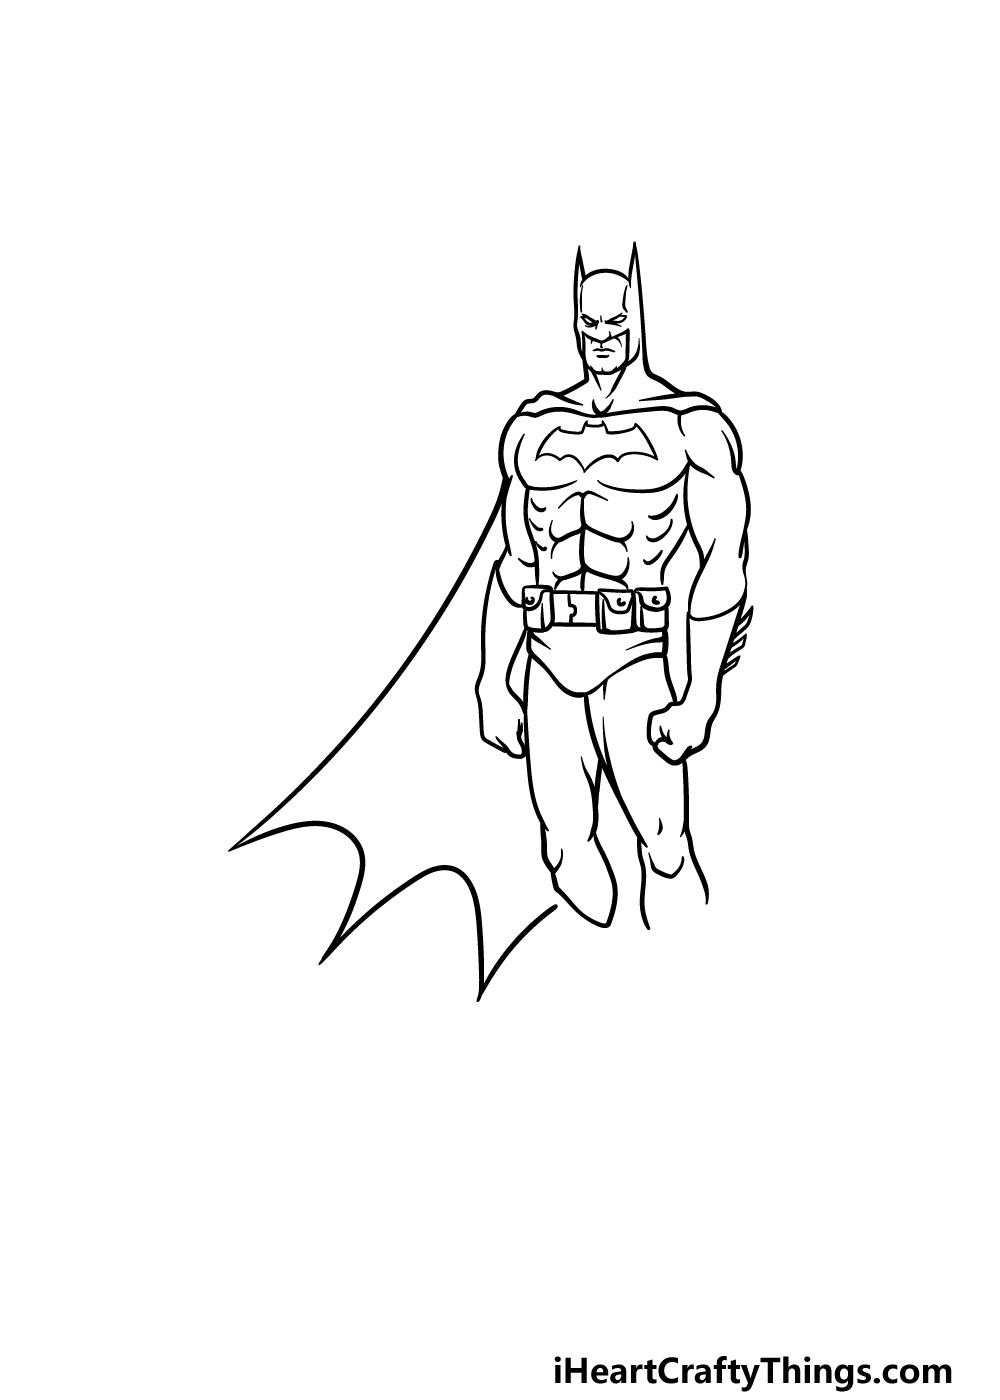 drawing Batman step 4